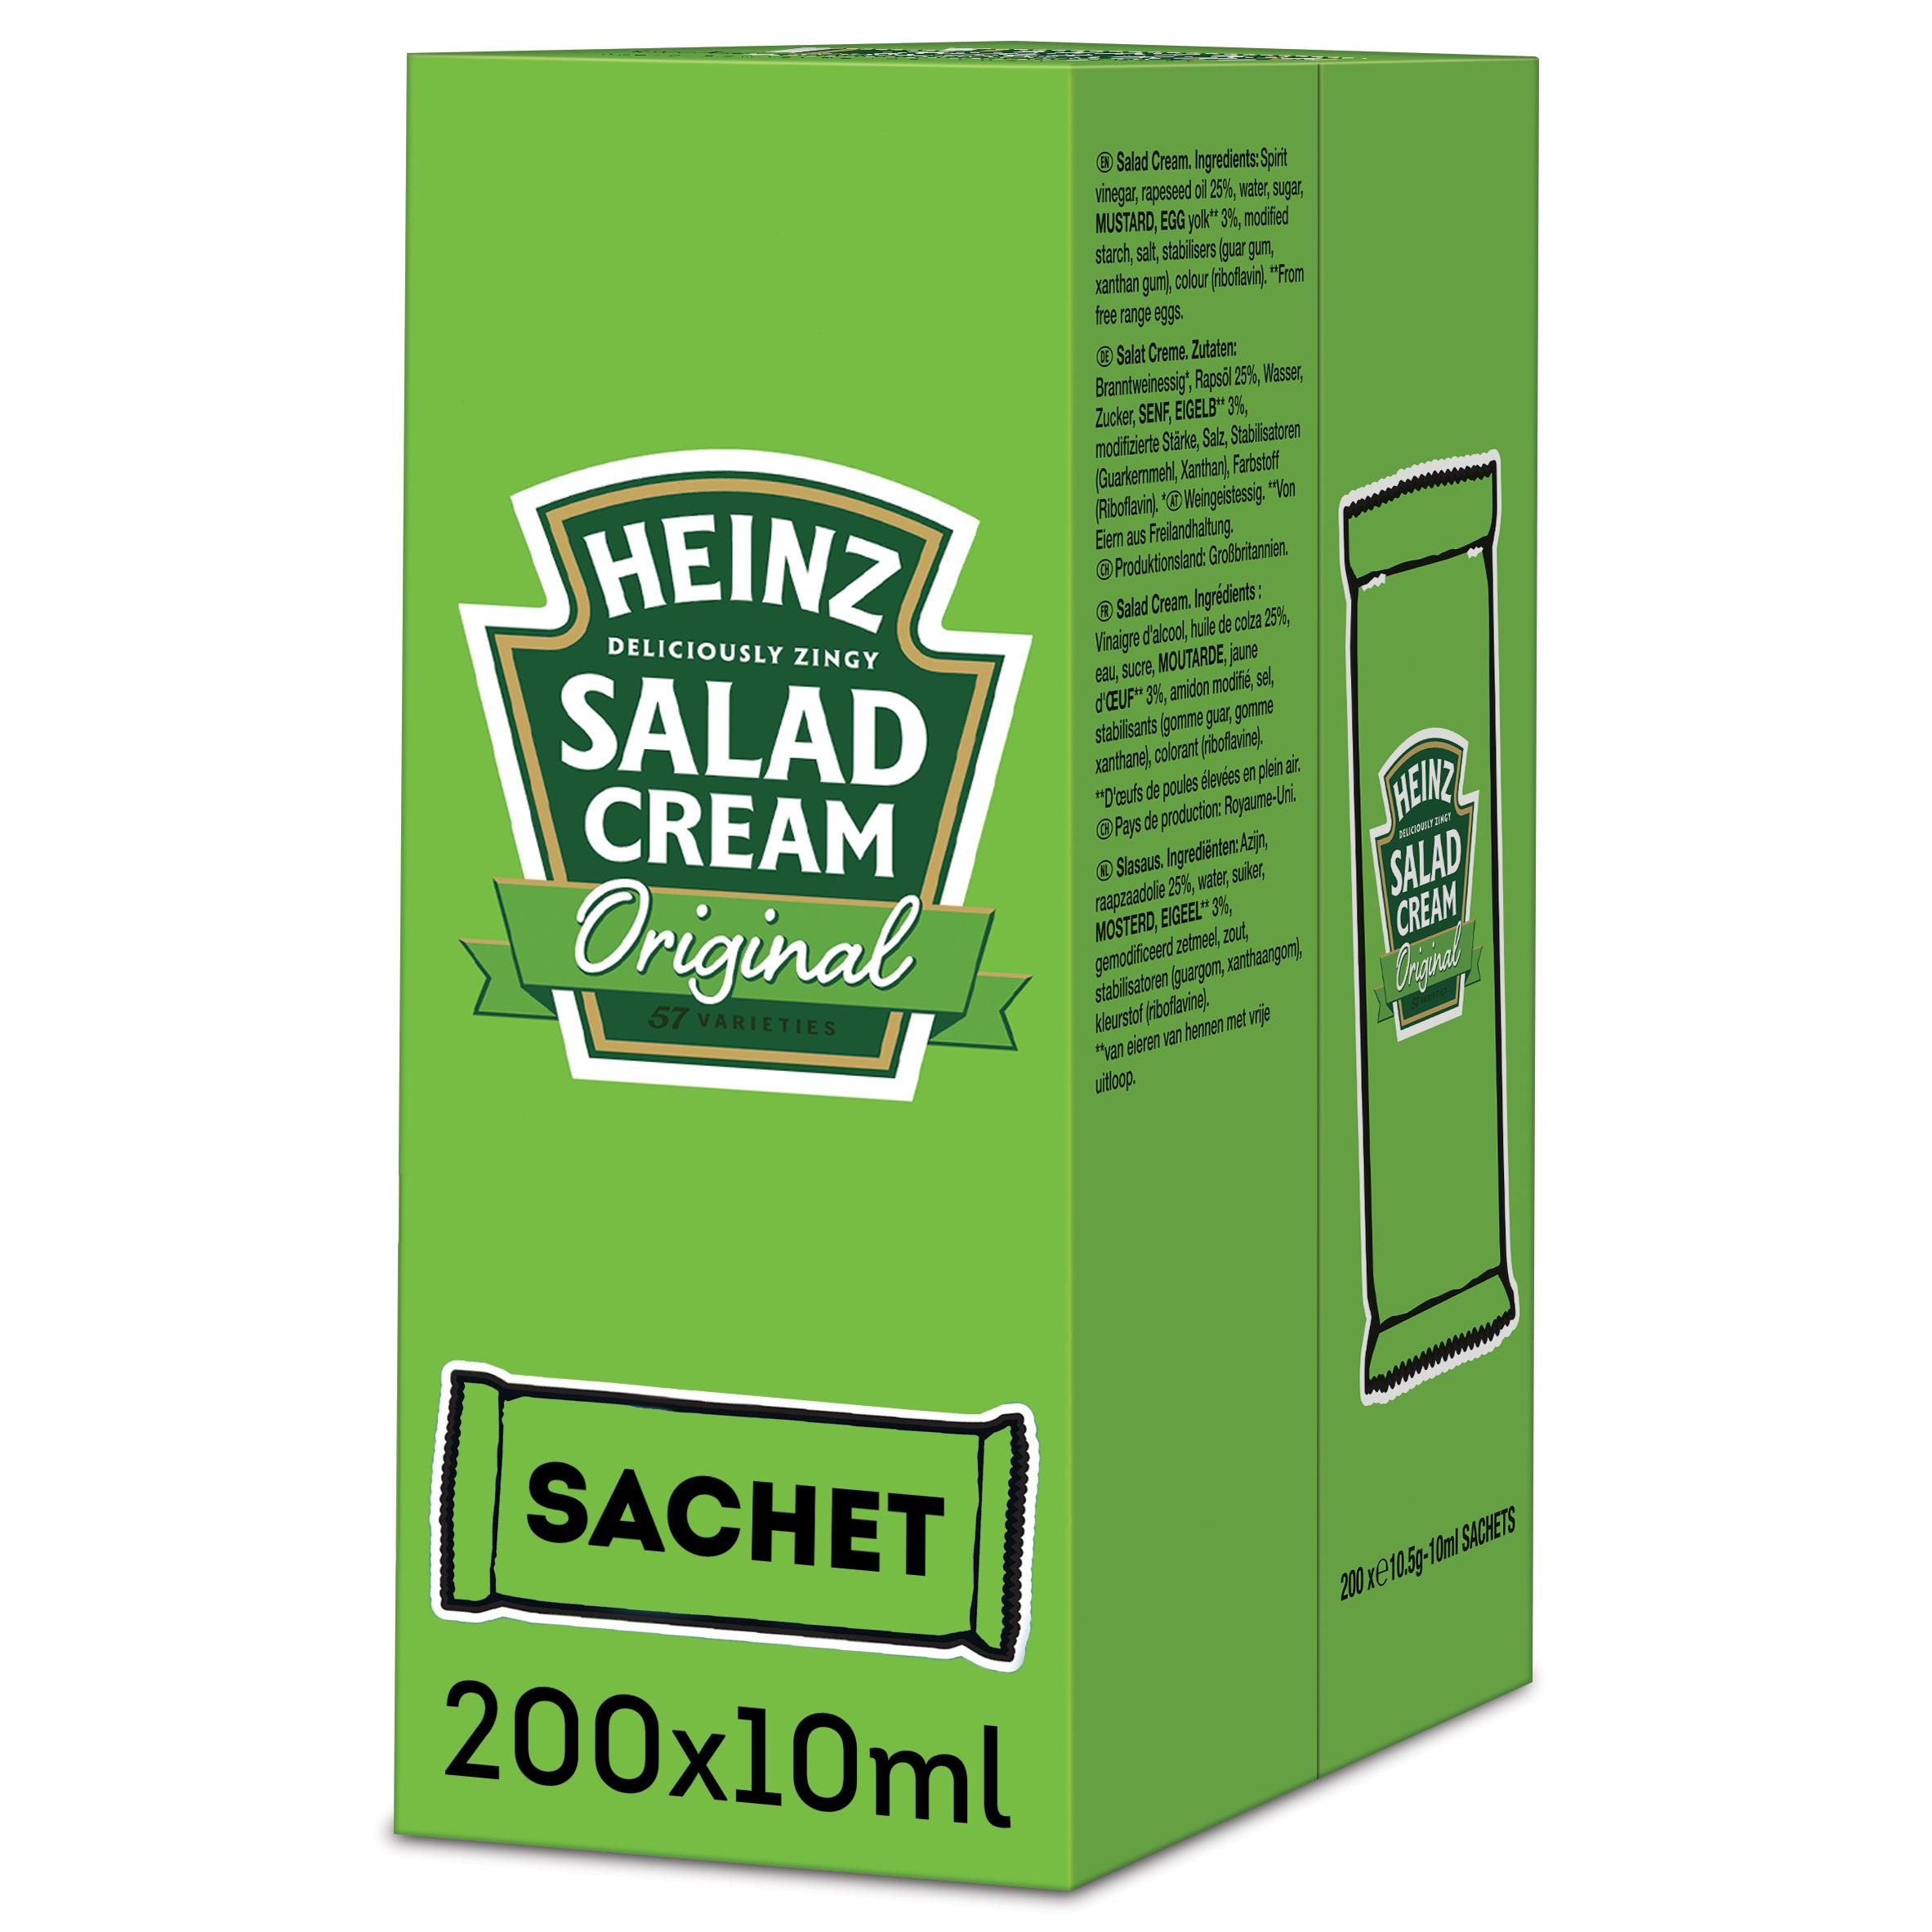 Heinz Salad Cream 10ml Sachet